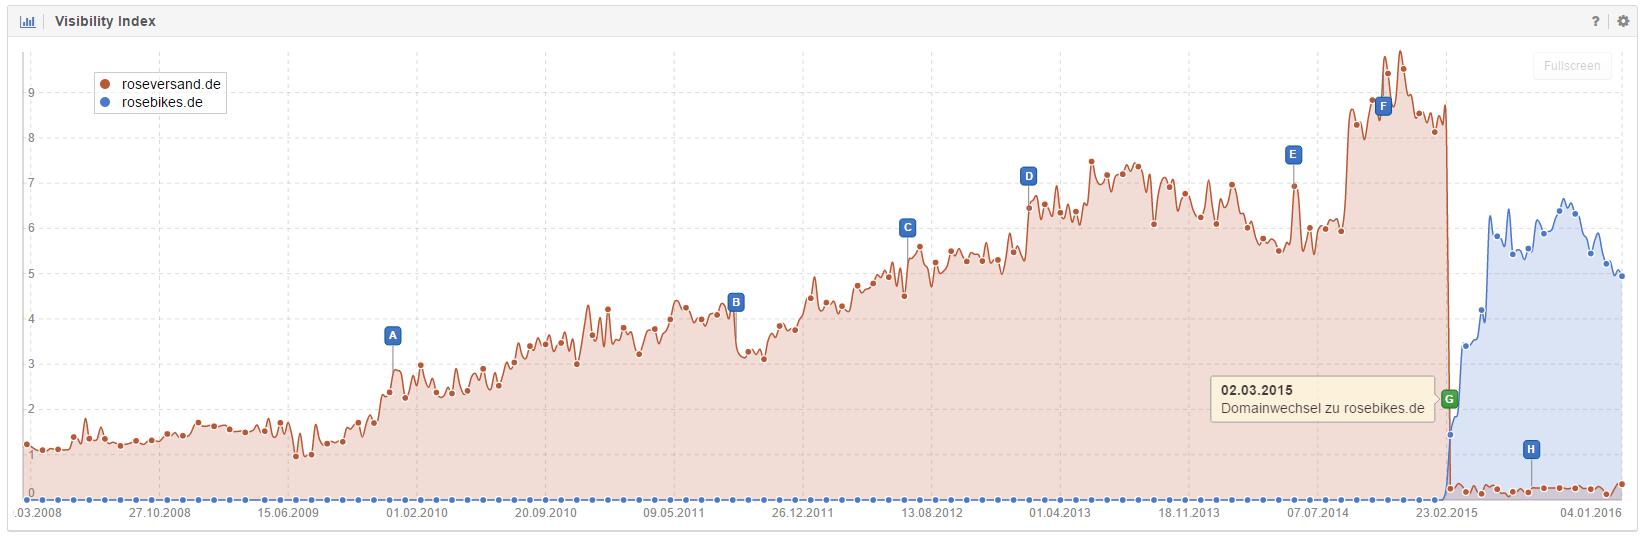 Domain roseversand.de vs. rosebikes.de